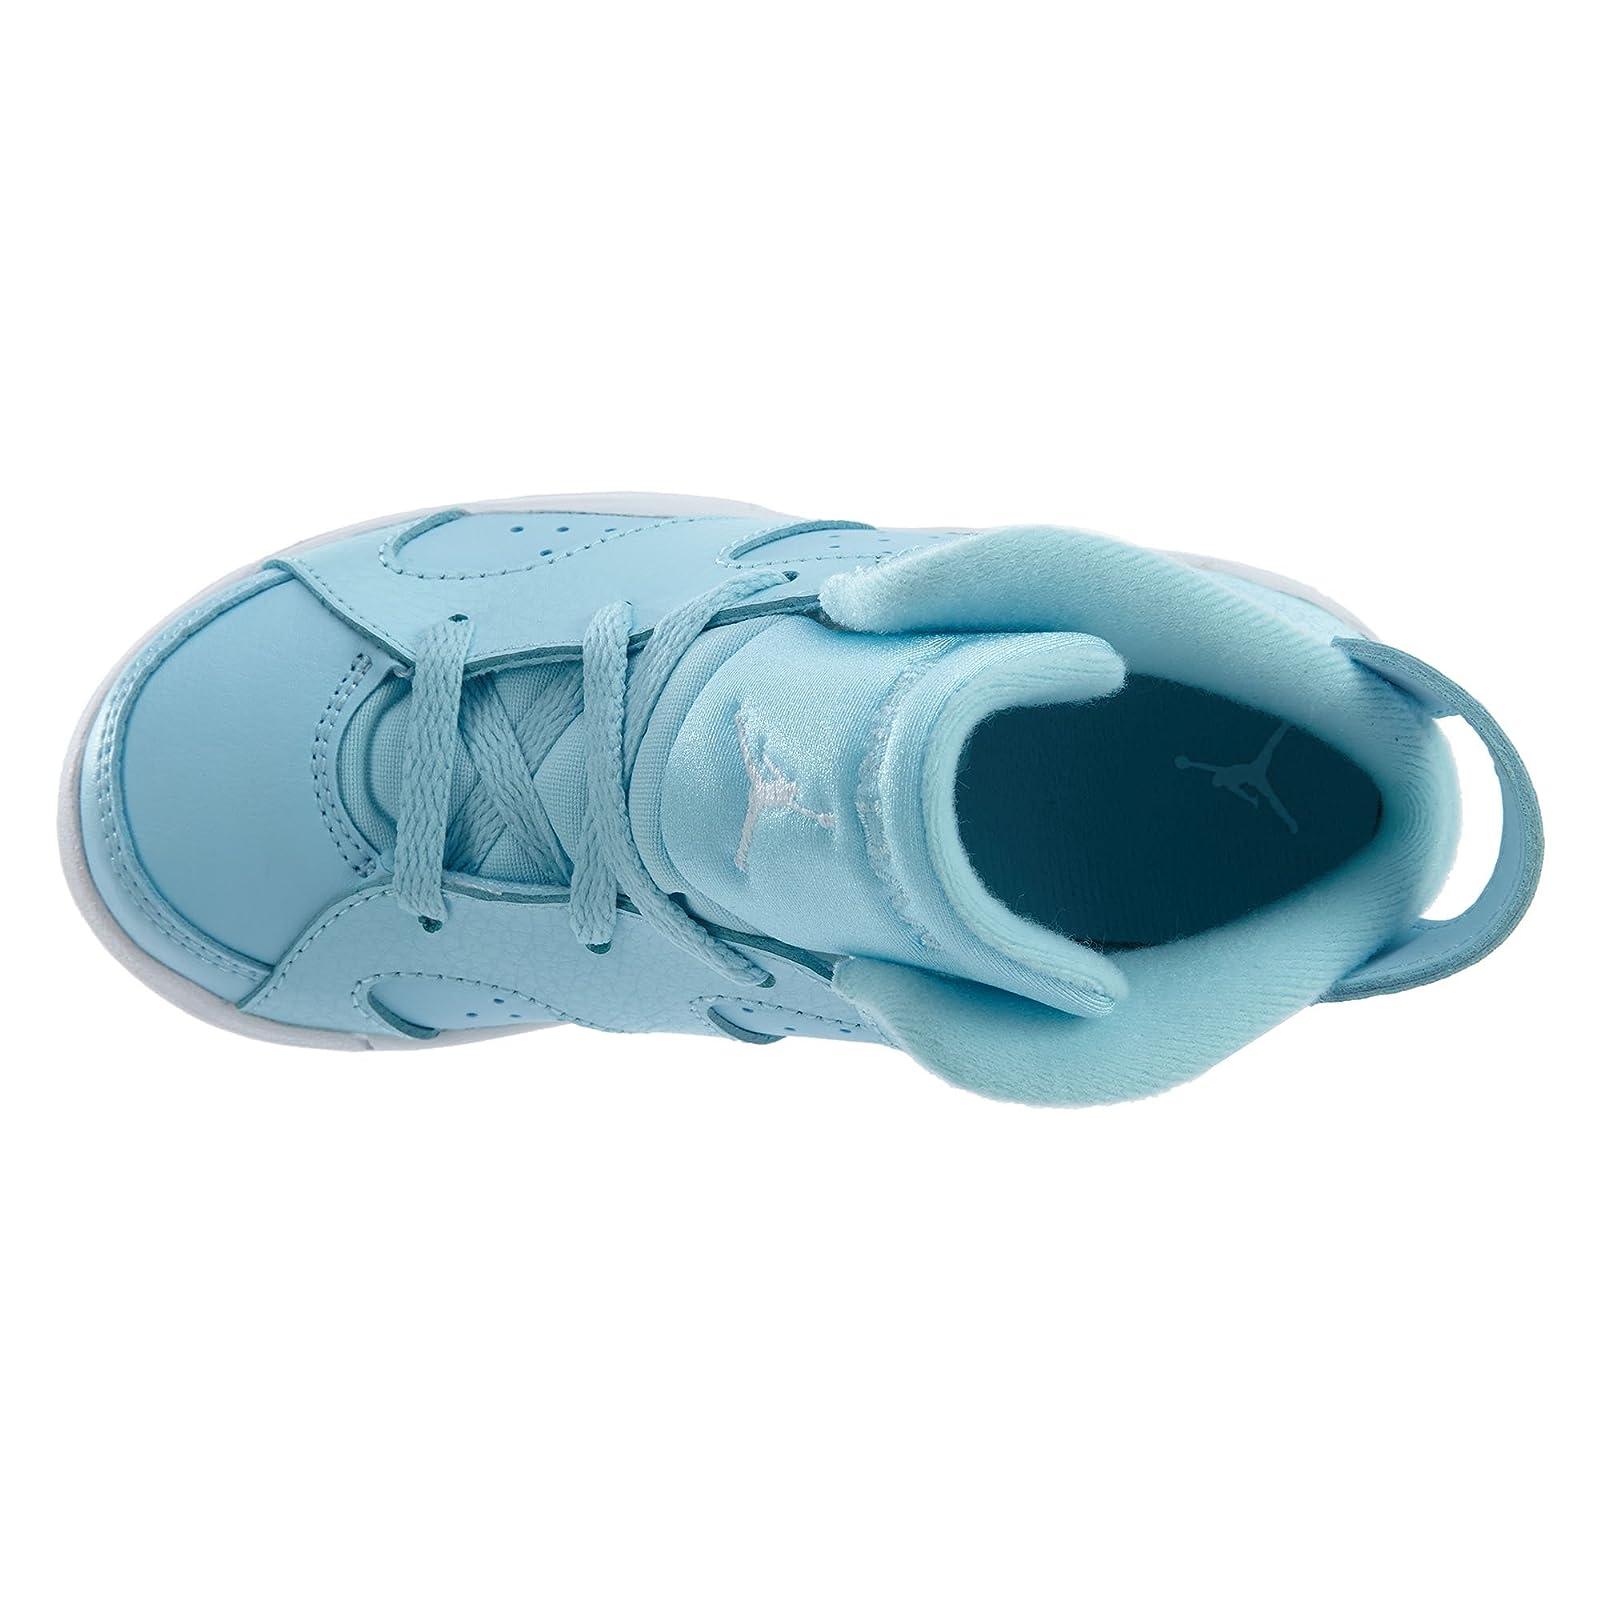 91c870097ba ... Jordan 6 Retro GT Girls Fashion-Sneakers 00 233160 7H - 5 ...